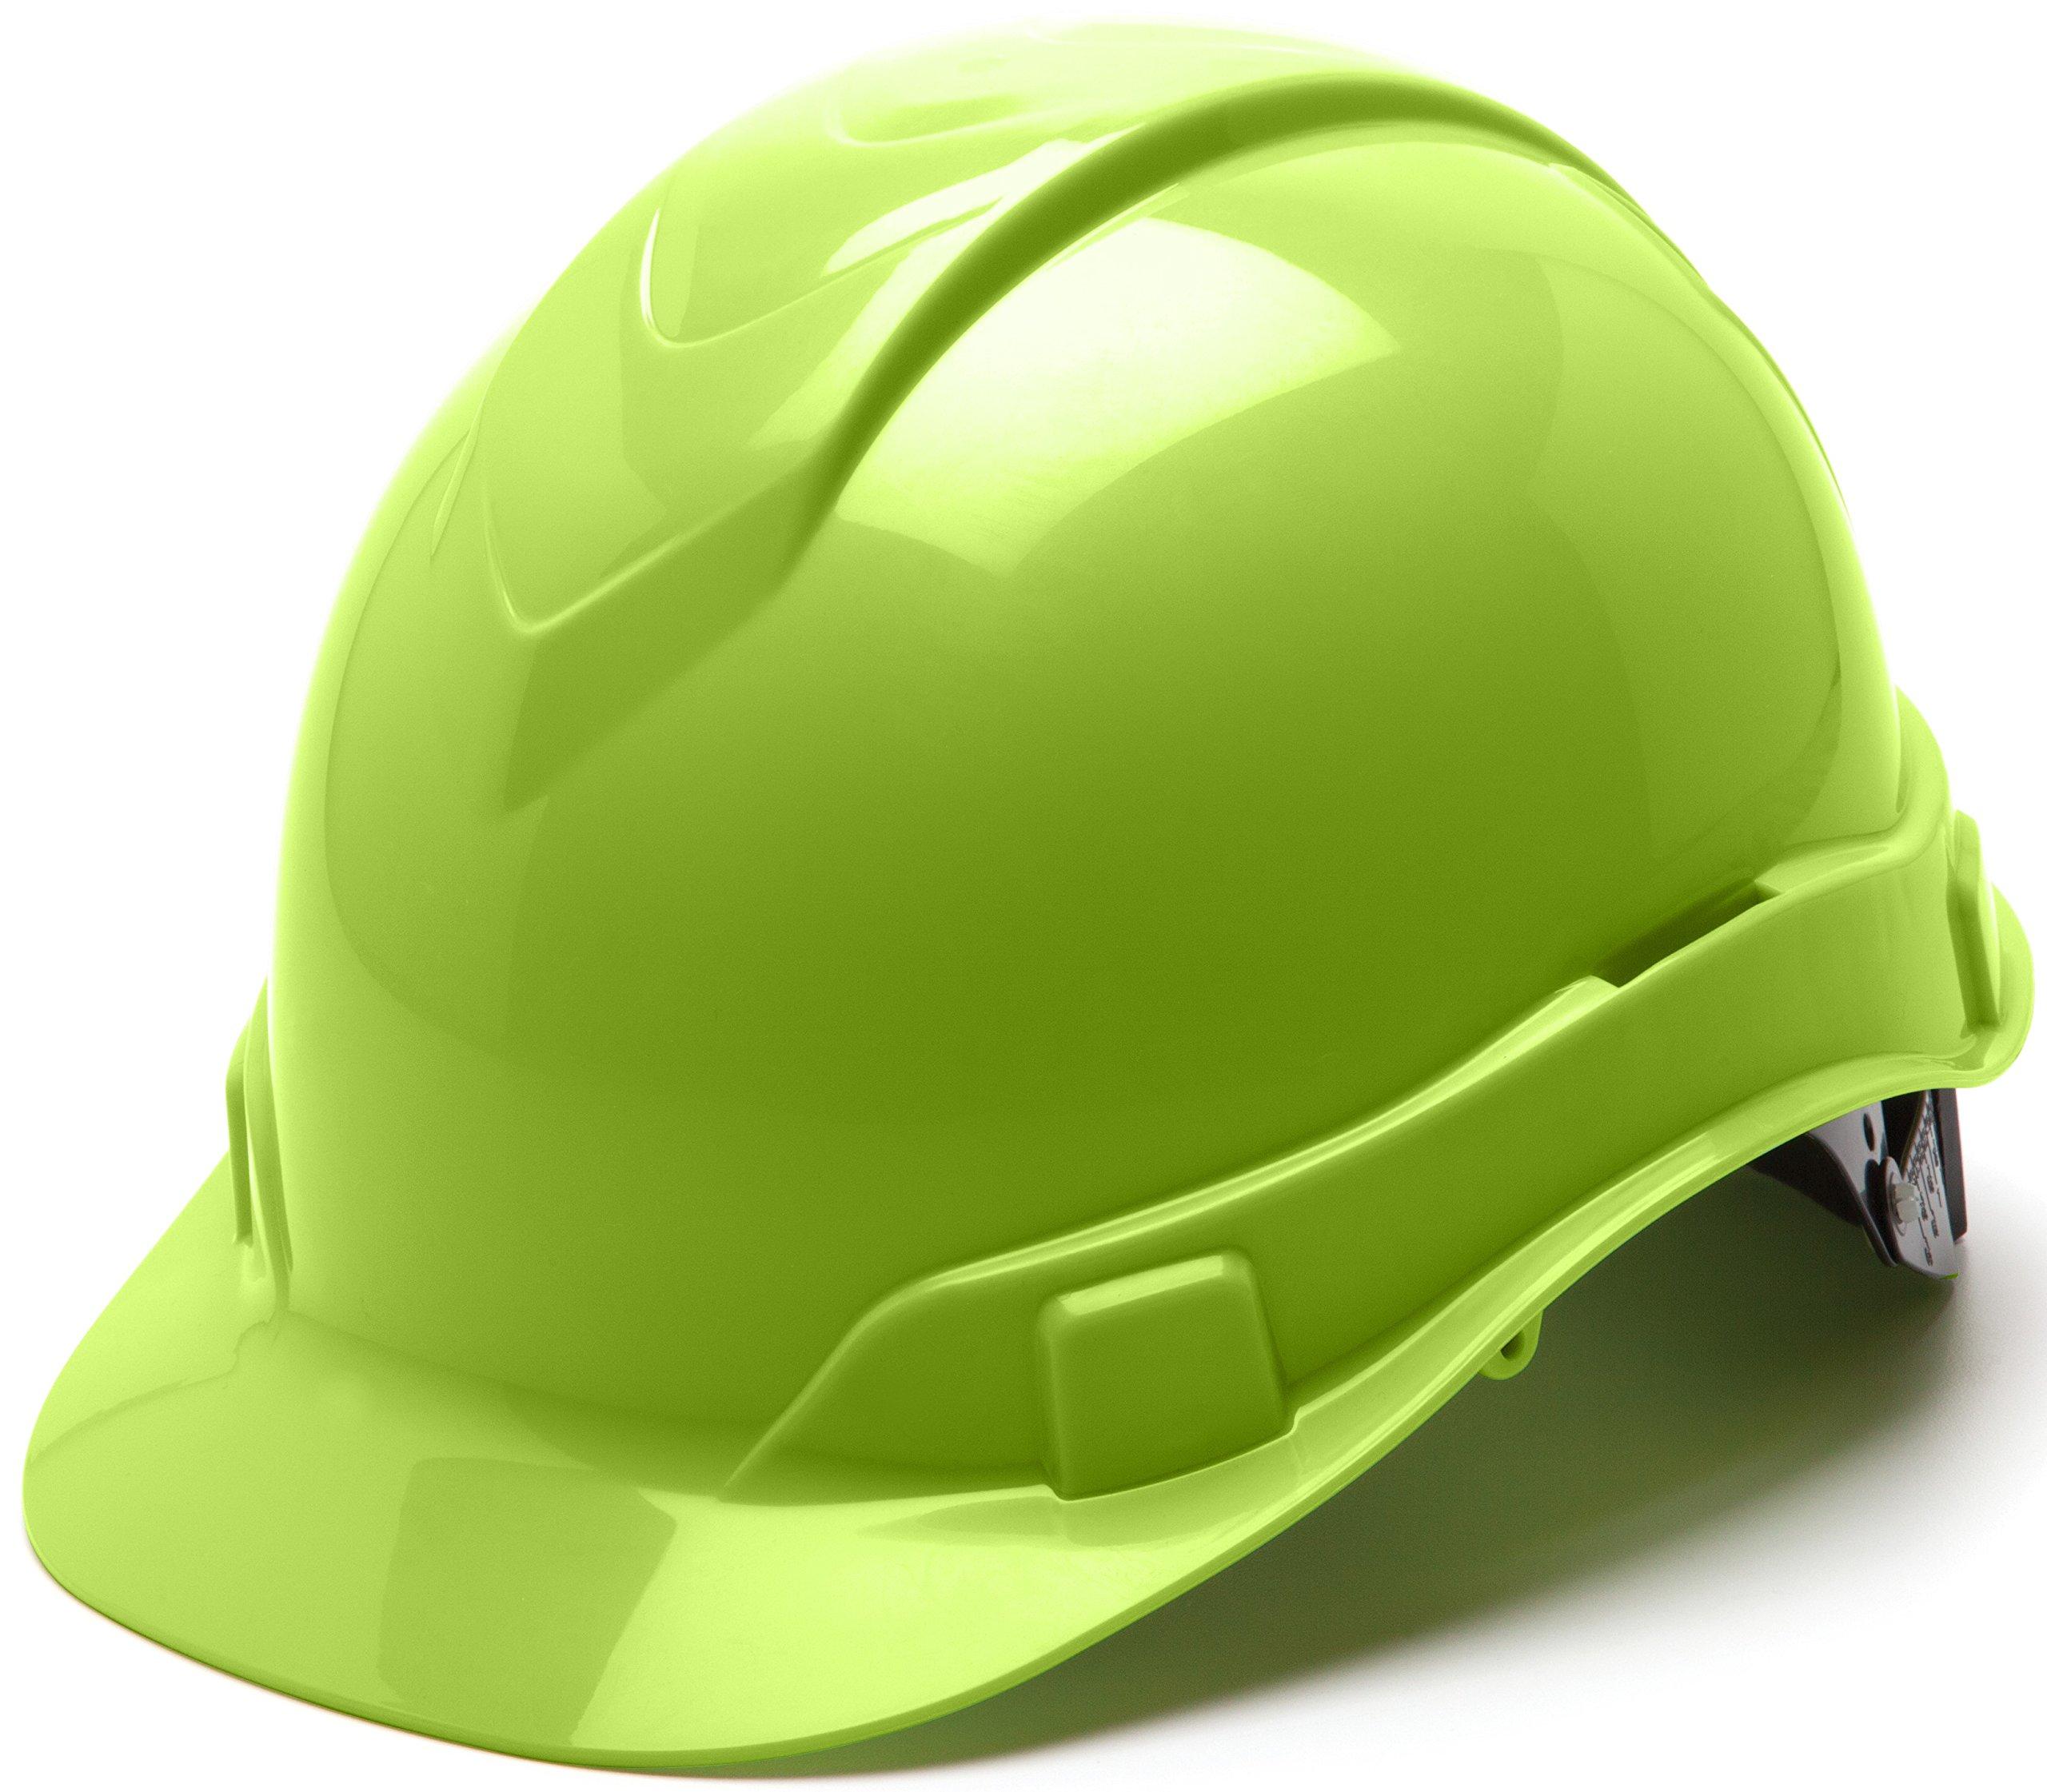 Pyramex Ridgeline Cap Style Hard Hat, 6 Point Ratchet Suspension, Hi Vis Lime by Pyramex Safety (Image #1)